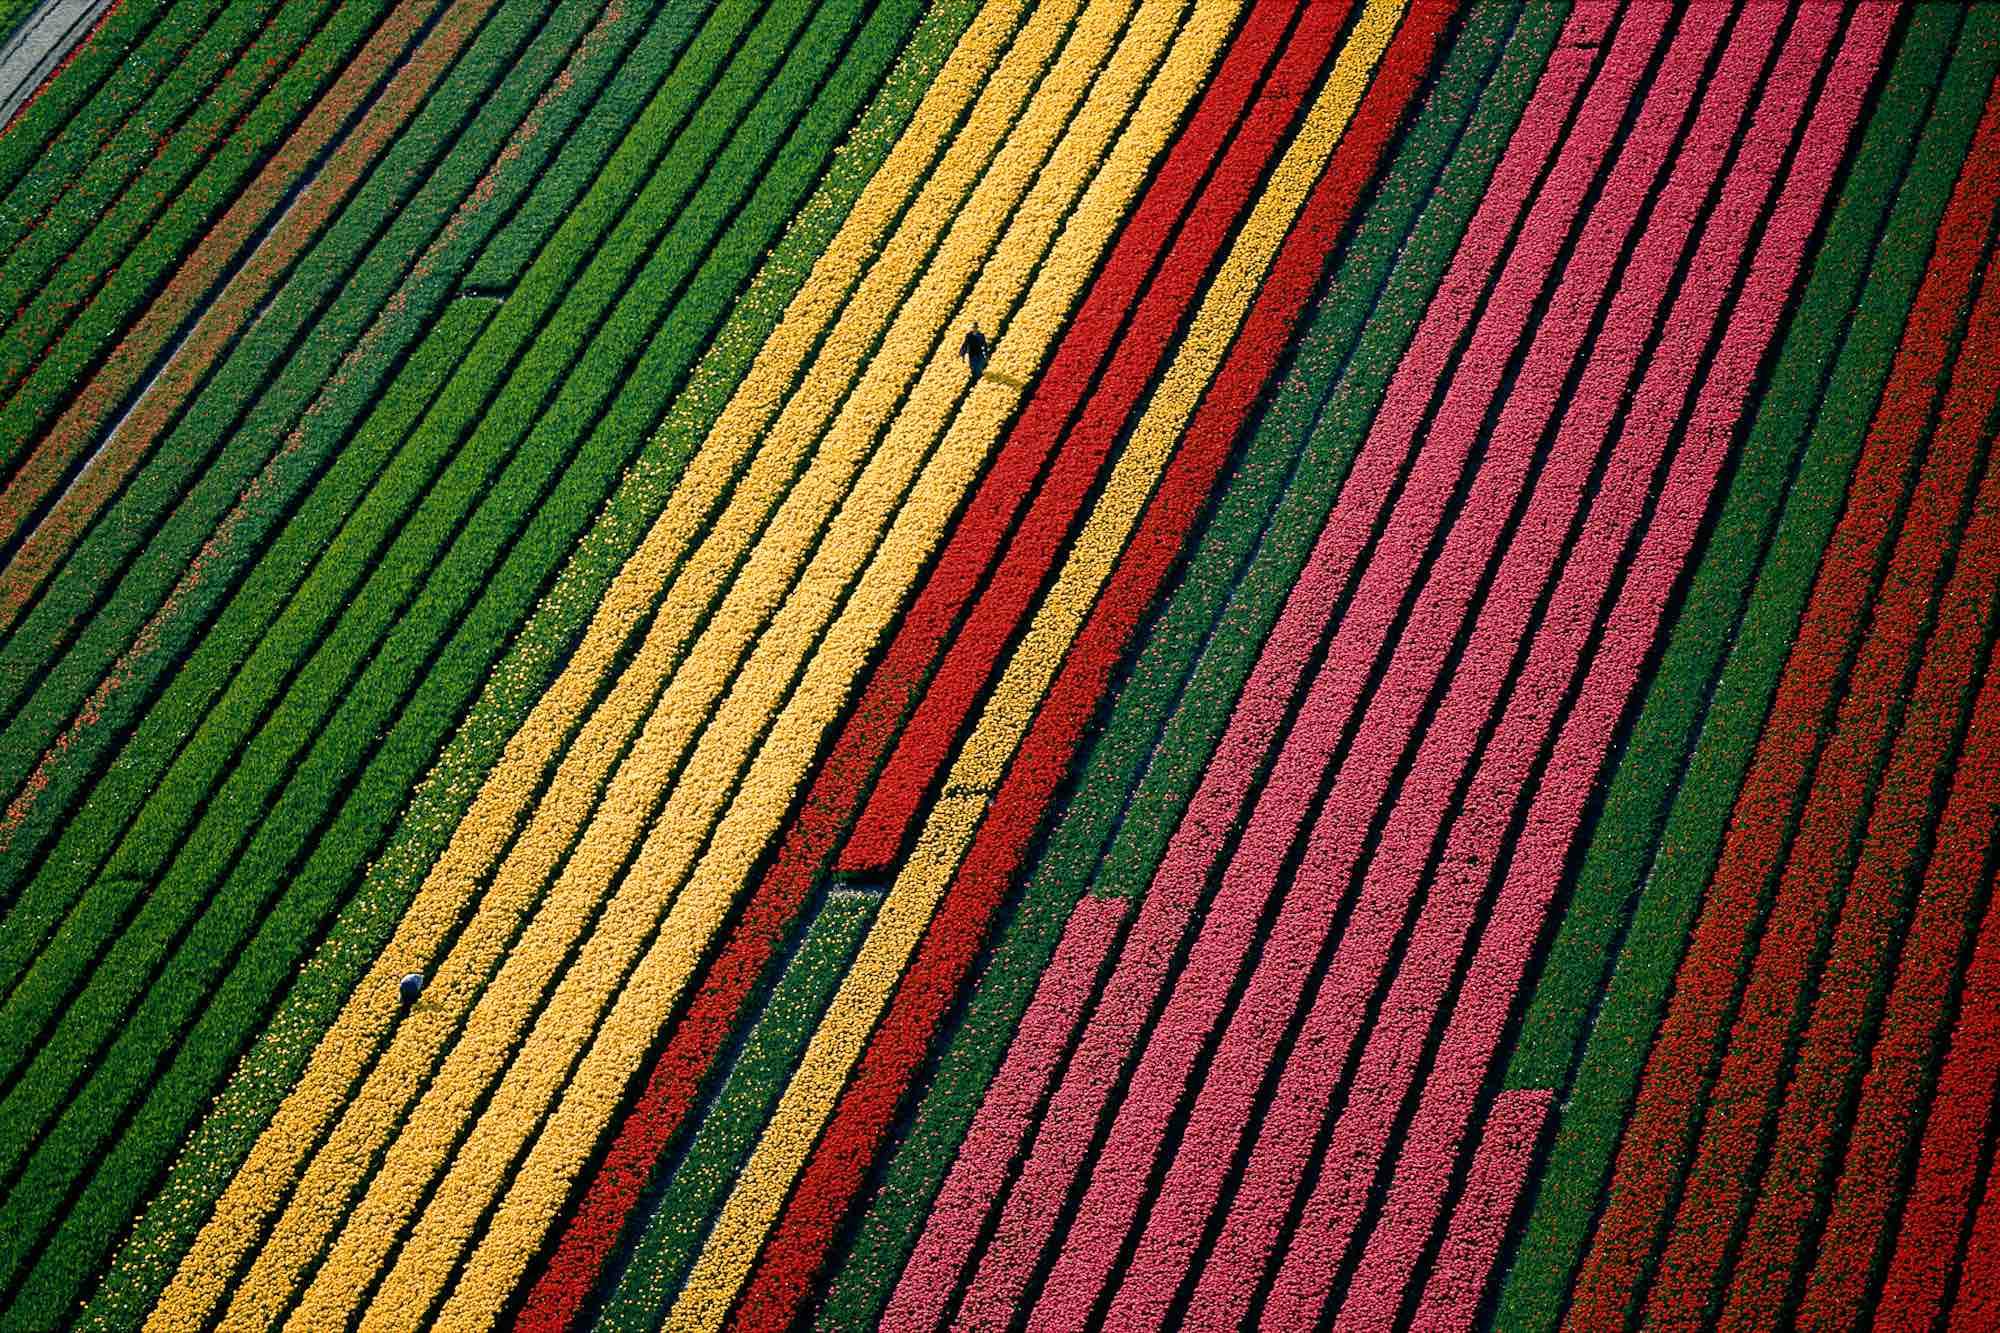 Tulips - Yann Arthus-Bertrand